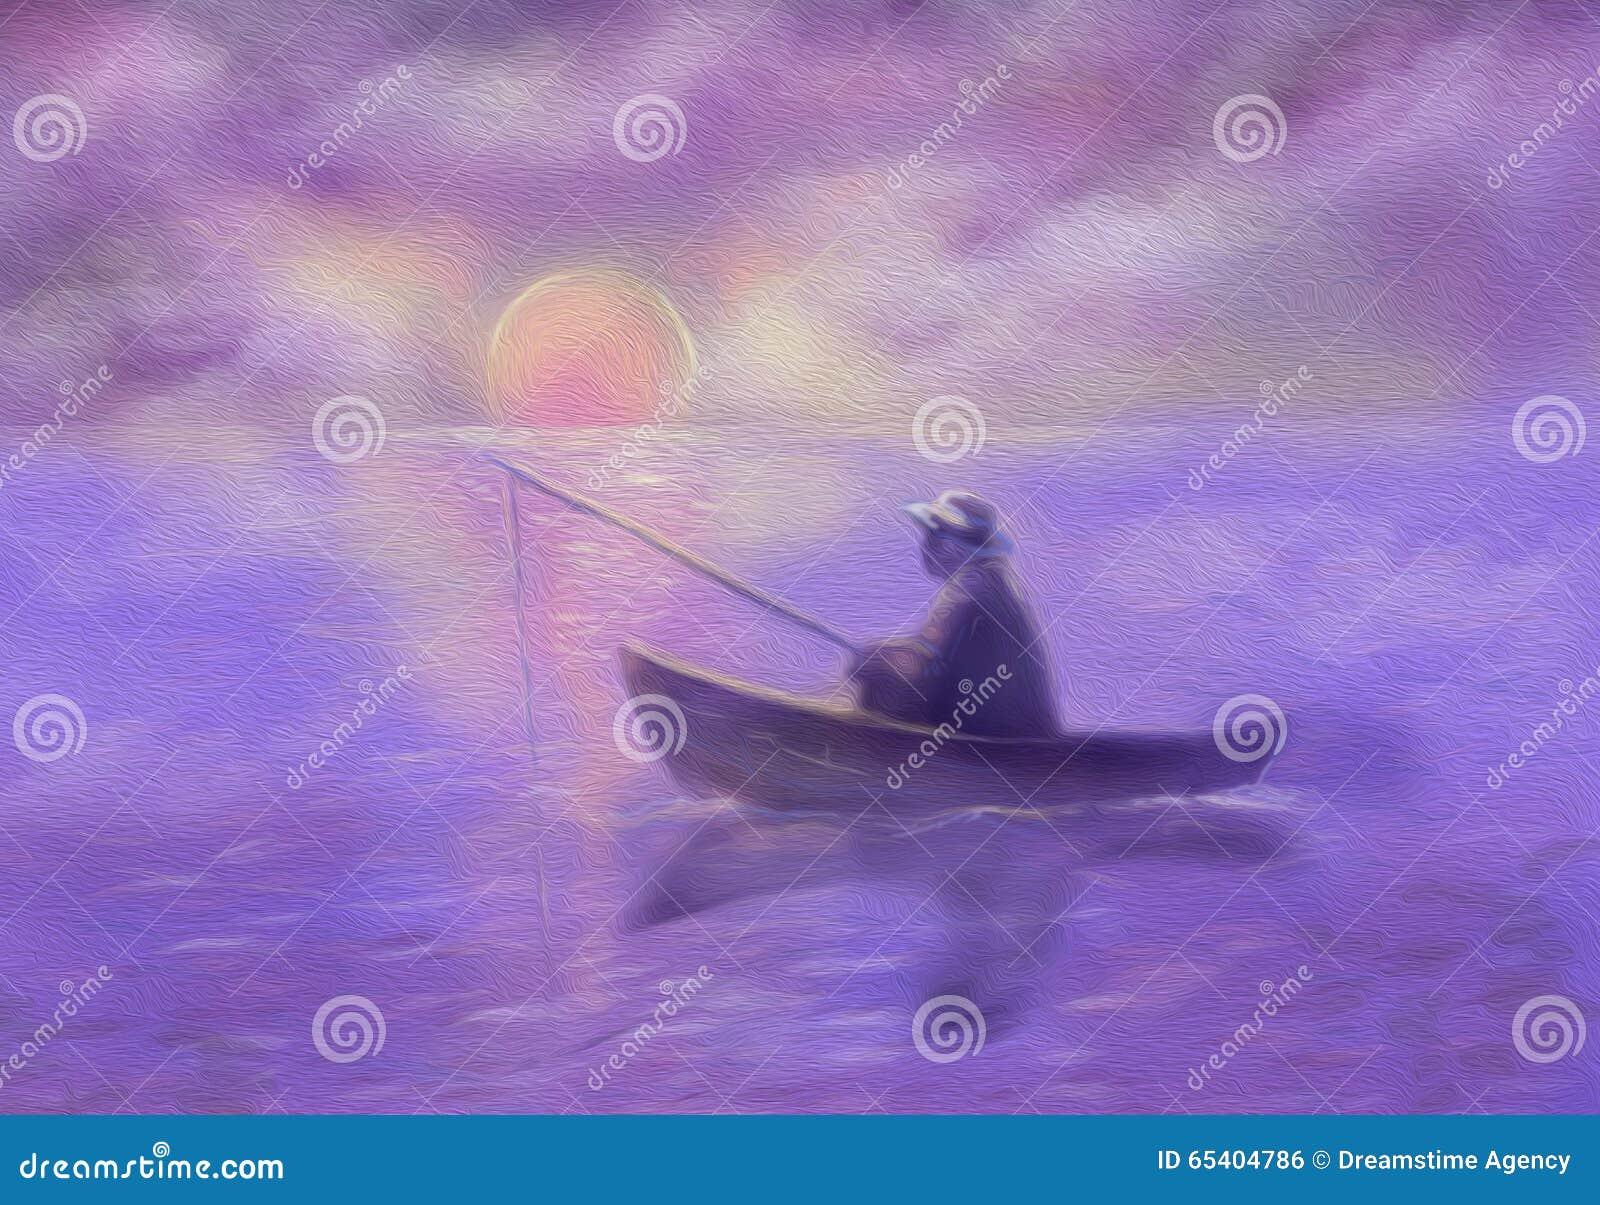 Man in hat catches fish at sunrise. Illustration.